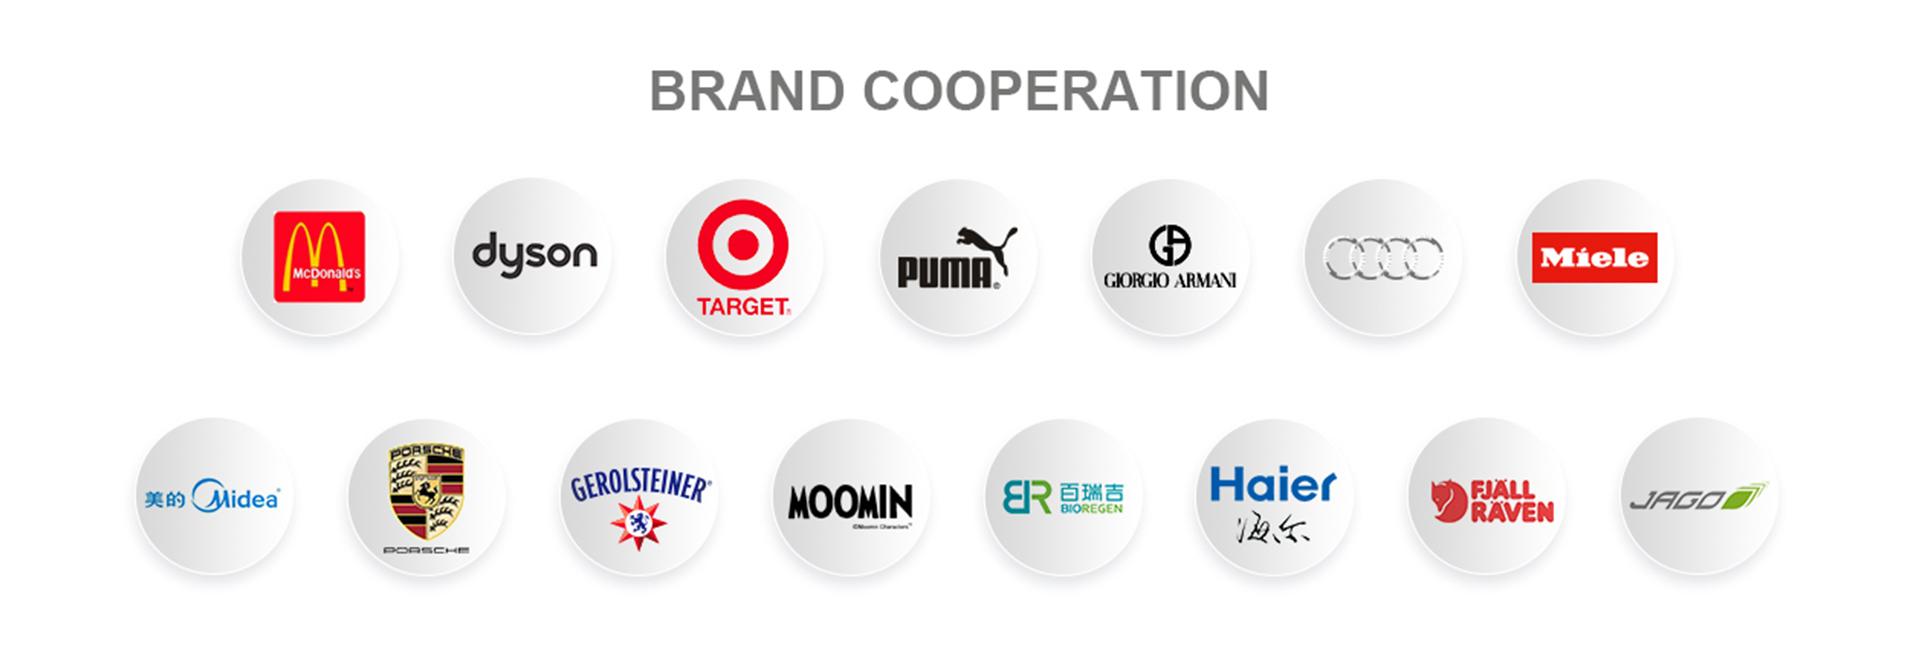 cooperation-brand